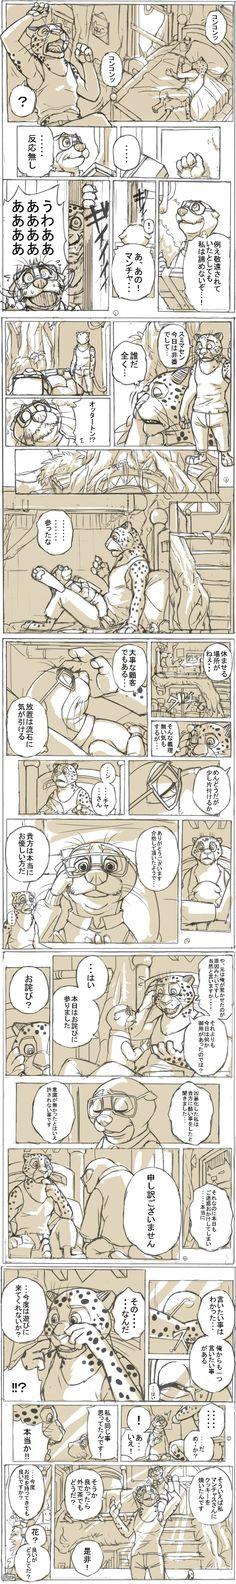 Zootopia cartoon by inubiko